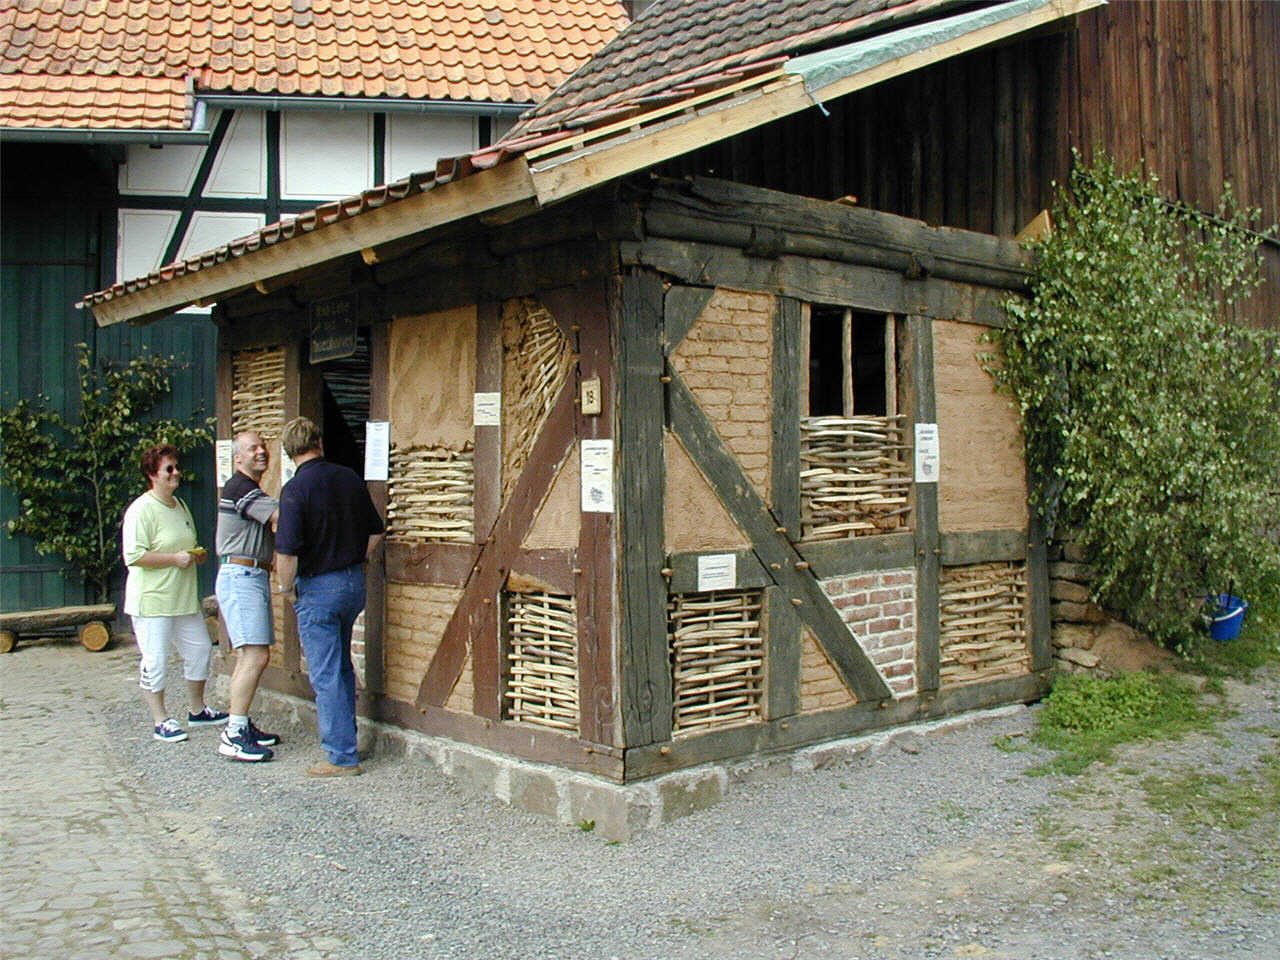 Bautechniken bei ehemals Ruhwedels Haus. (© Detlef Battefeld)